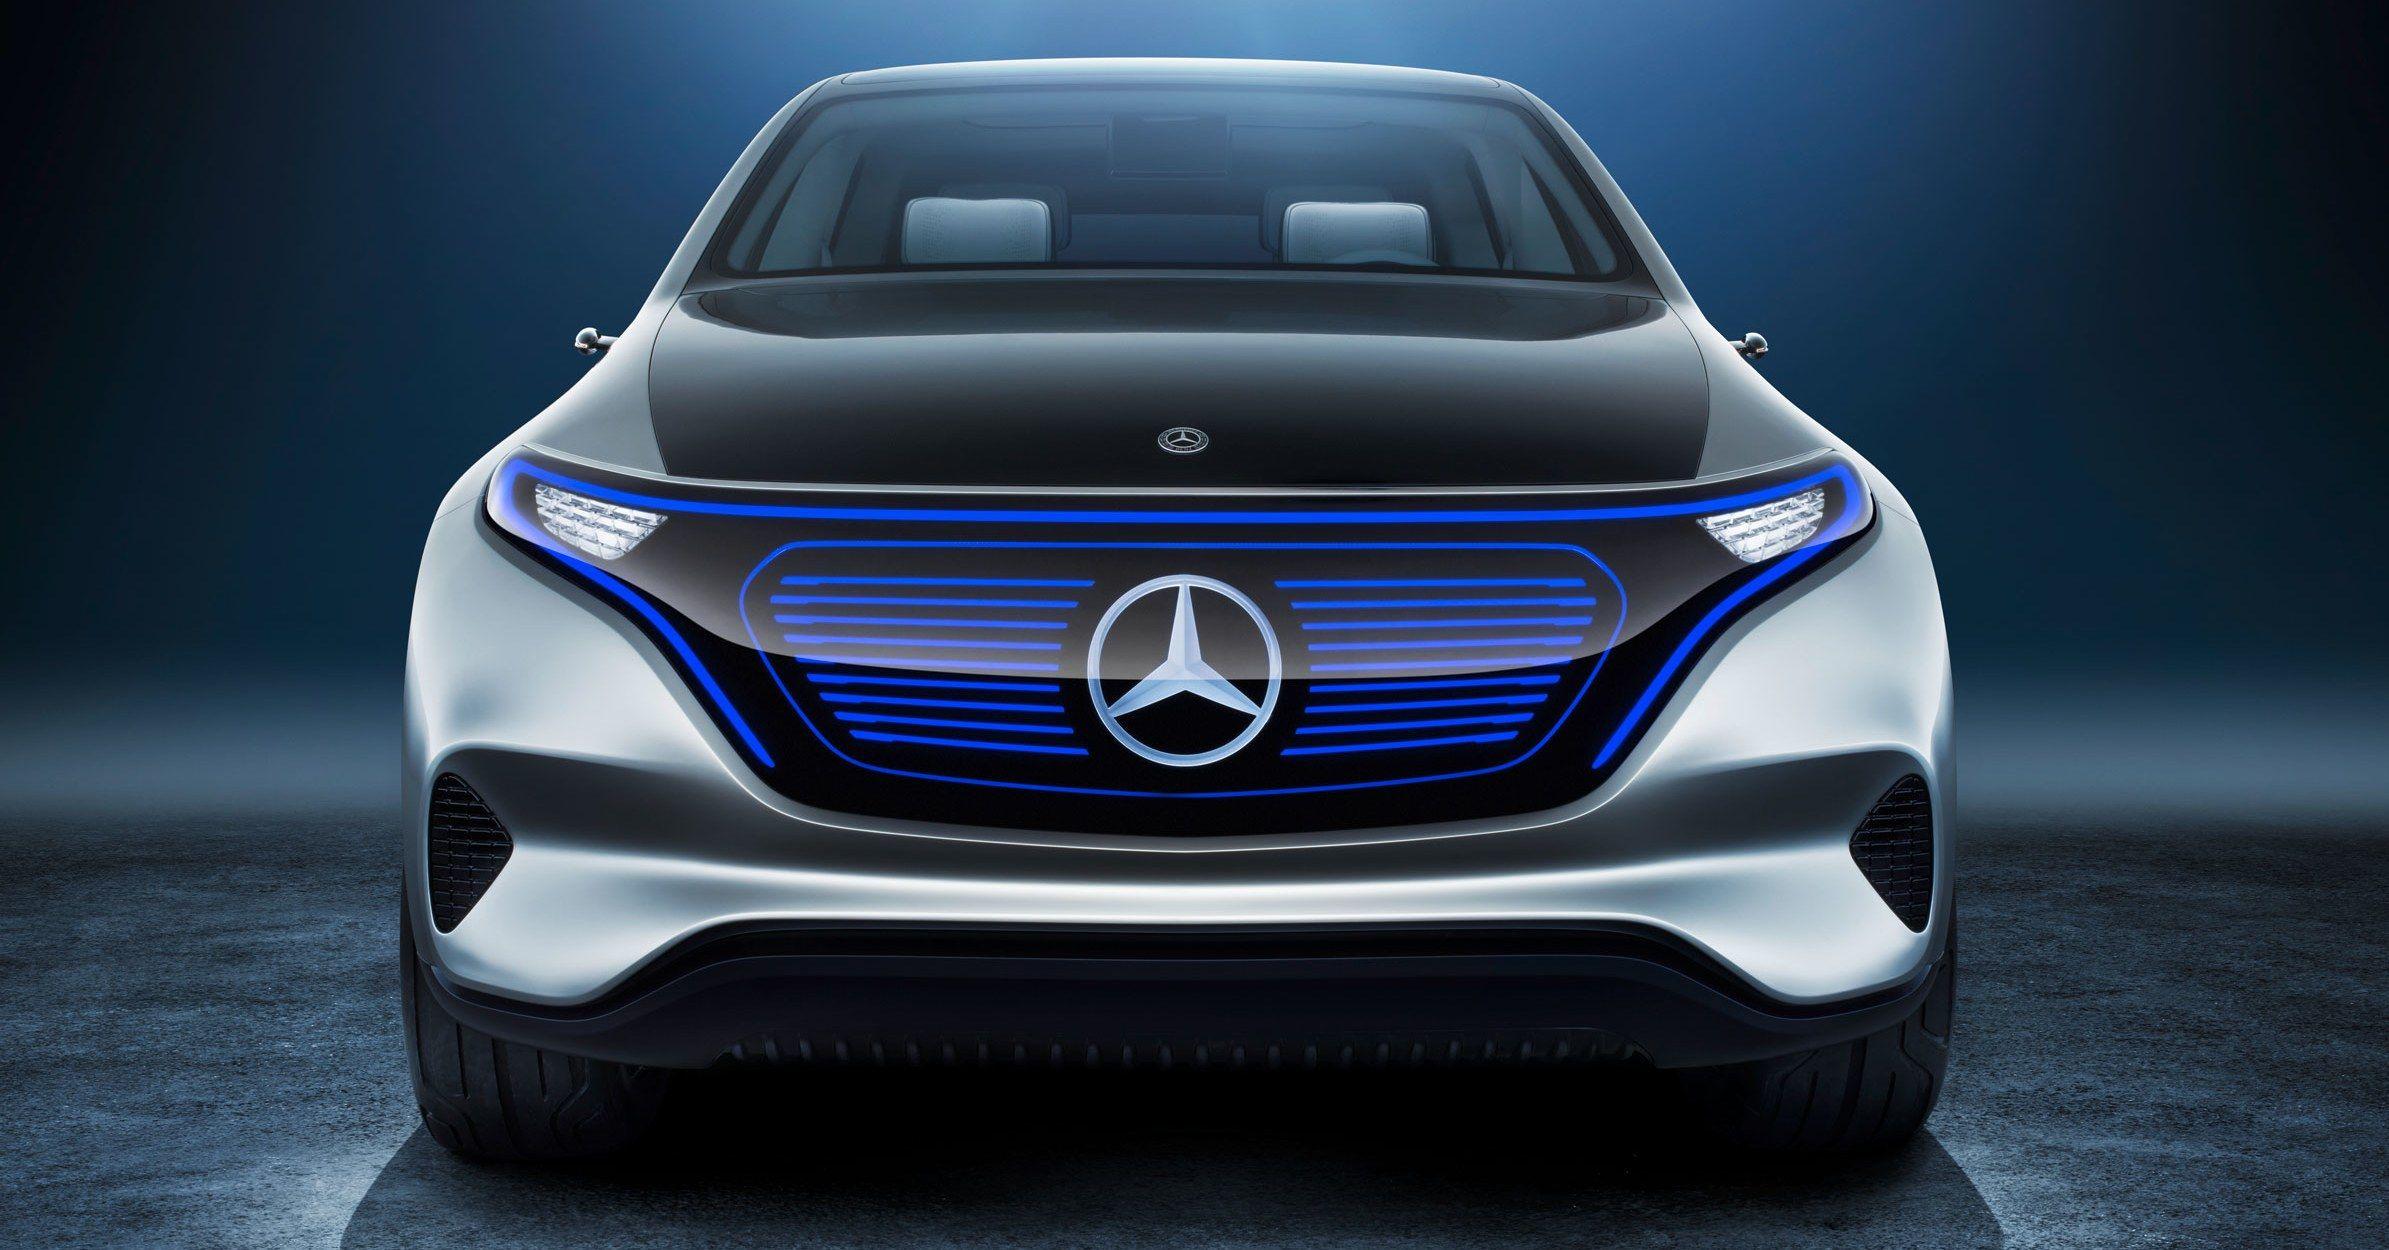 Mercedes Benz S Plan For Surviving The Auto Revolution Pam Mercedes Benz Autos Y Electrico